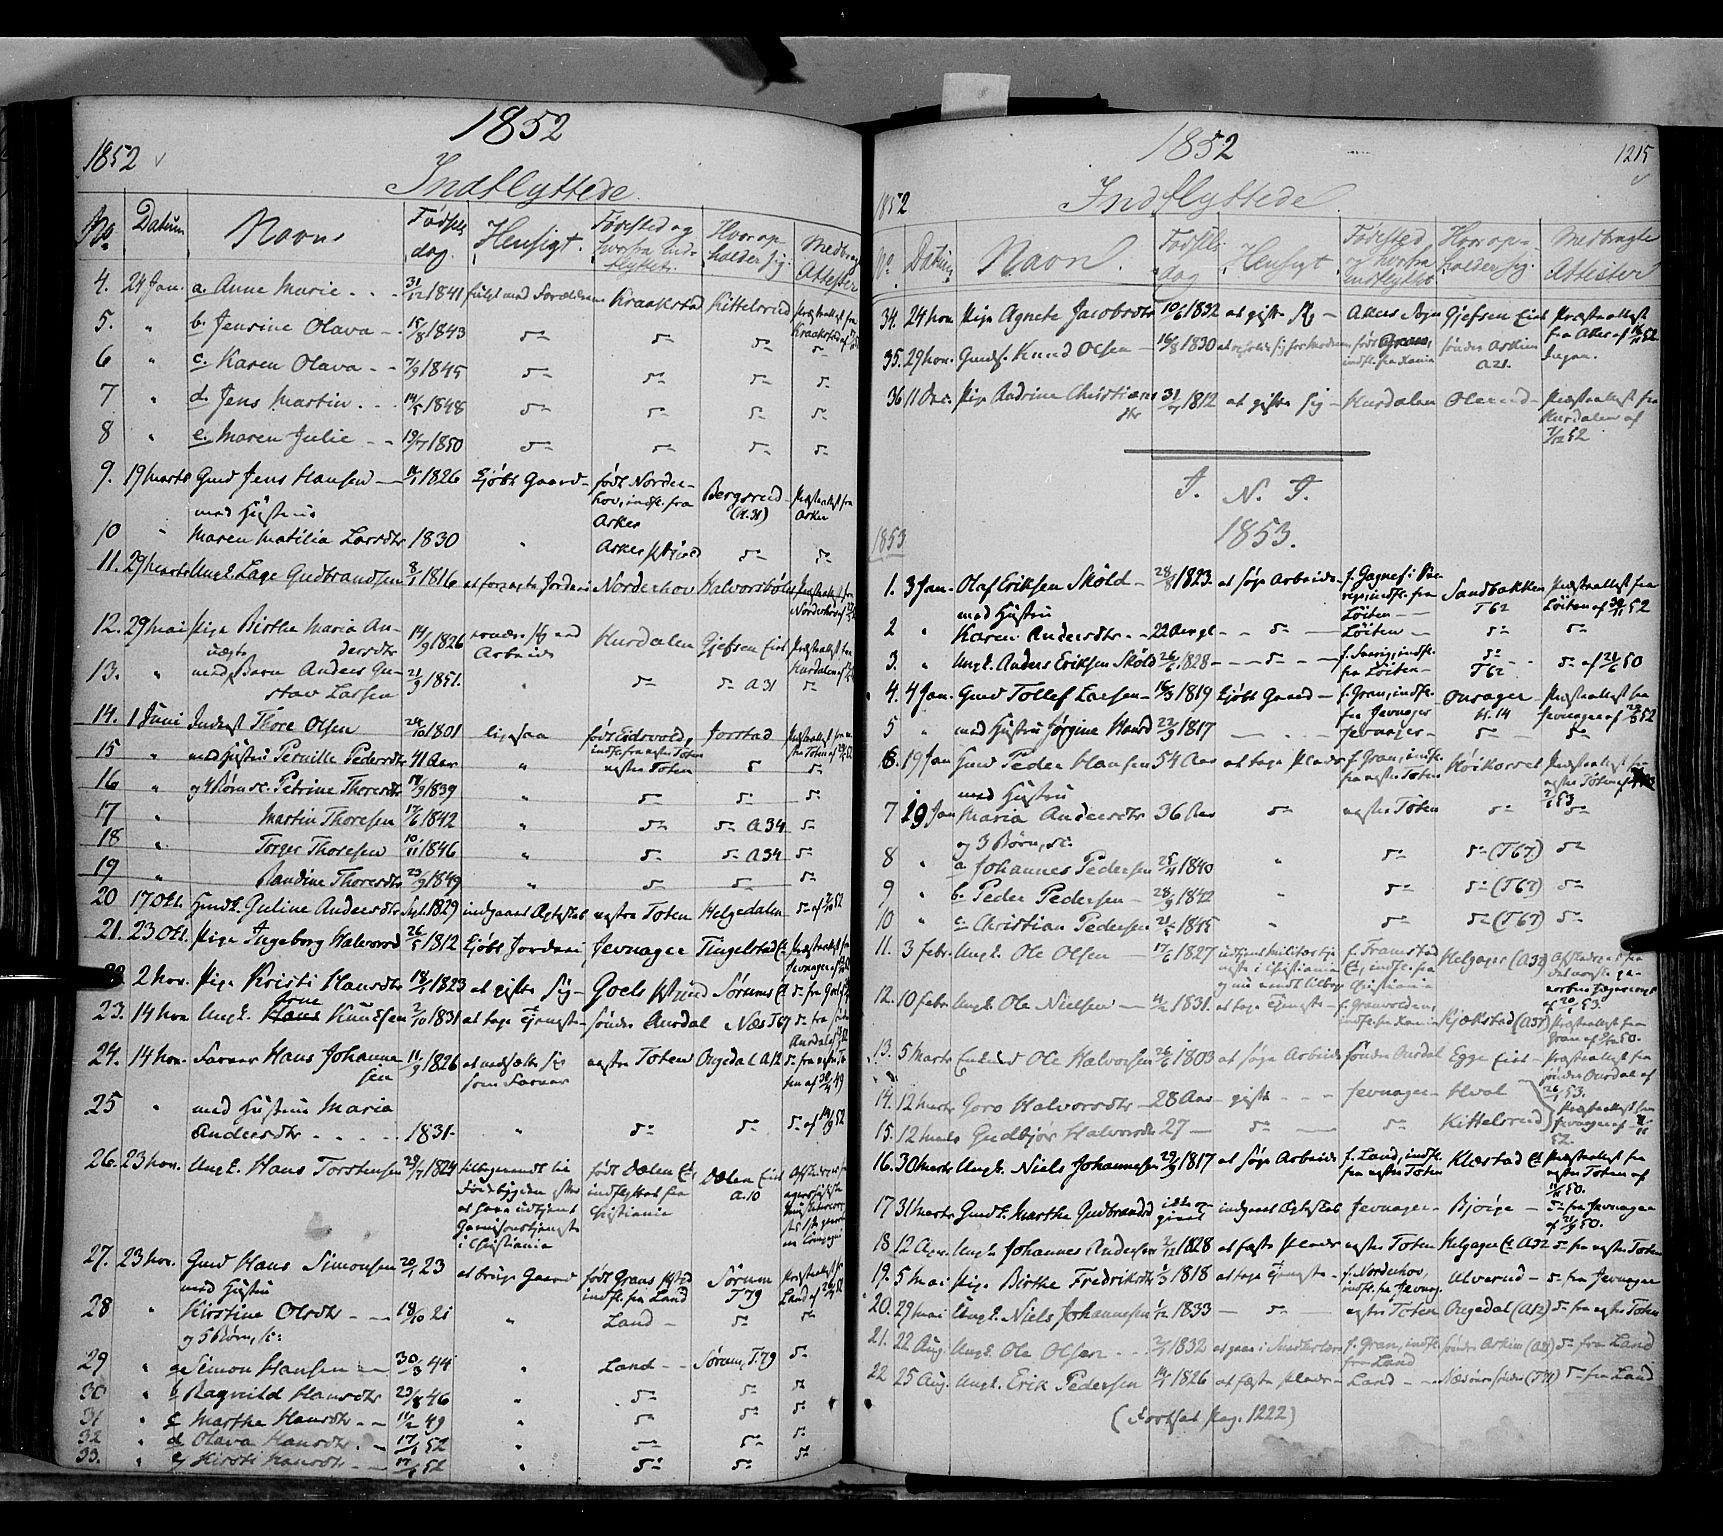 SAH, Gran prestekontor, Ministerialbok nr. 11, 1842-1856, s. 1214-1215